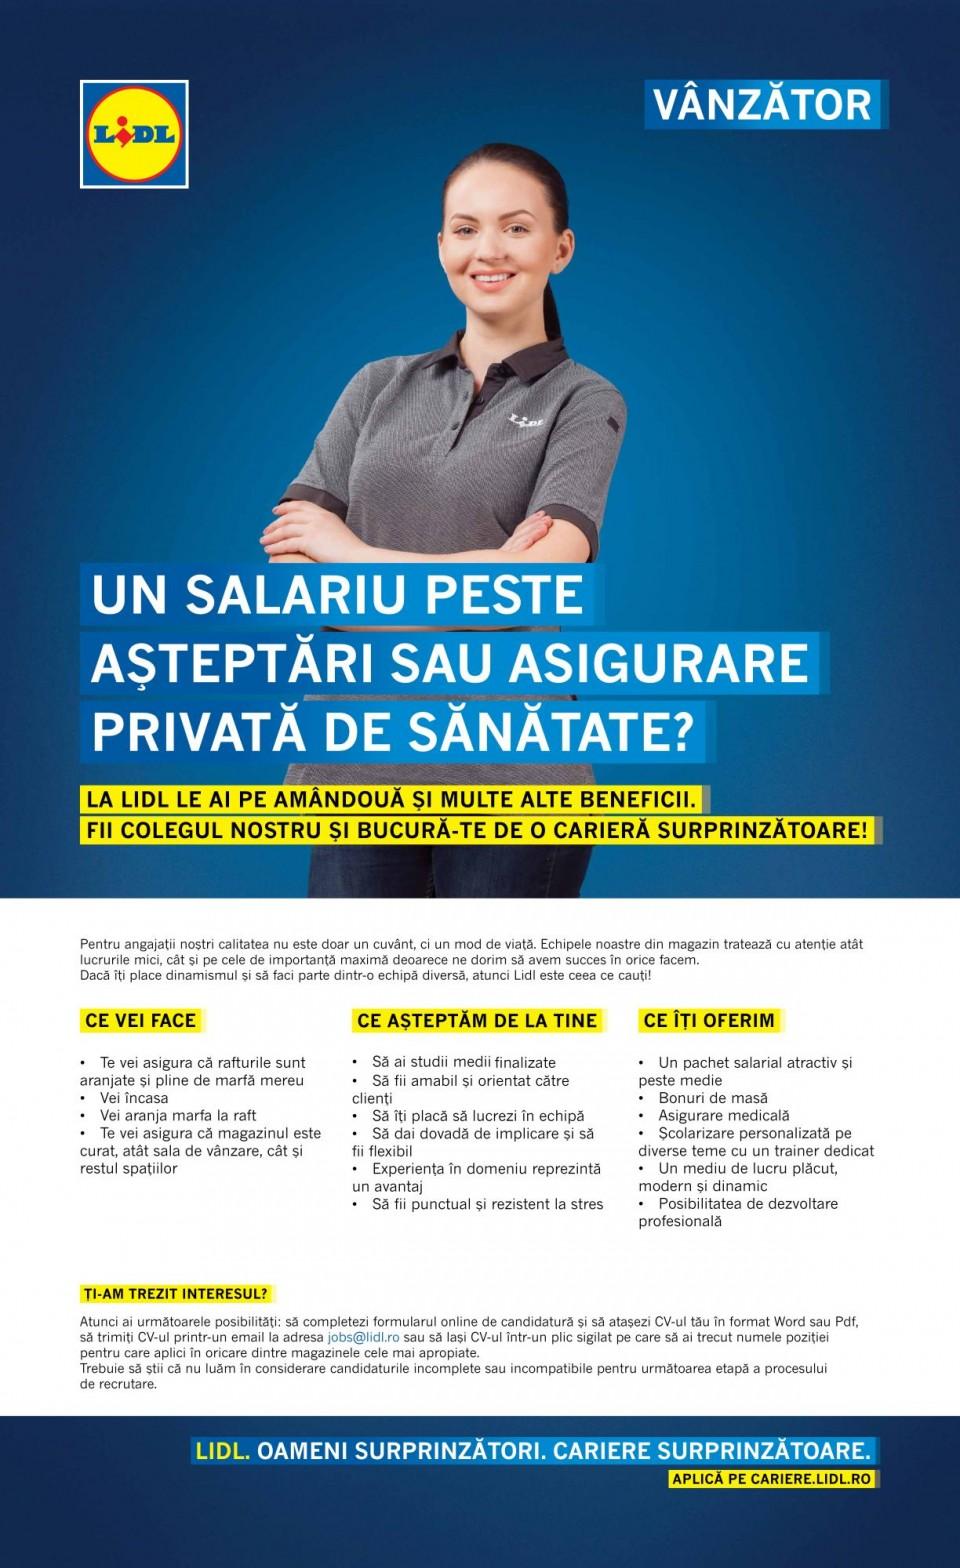 Vânzător București Iuliu Maniu Full-Time (f/m)